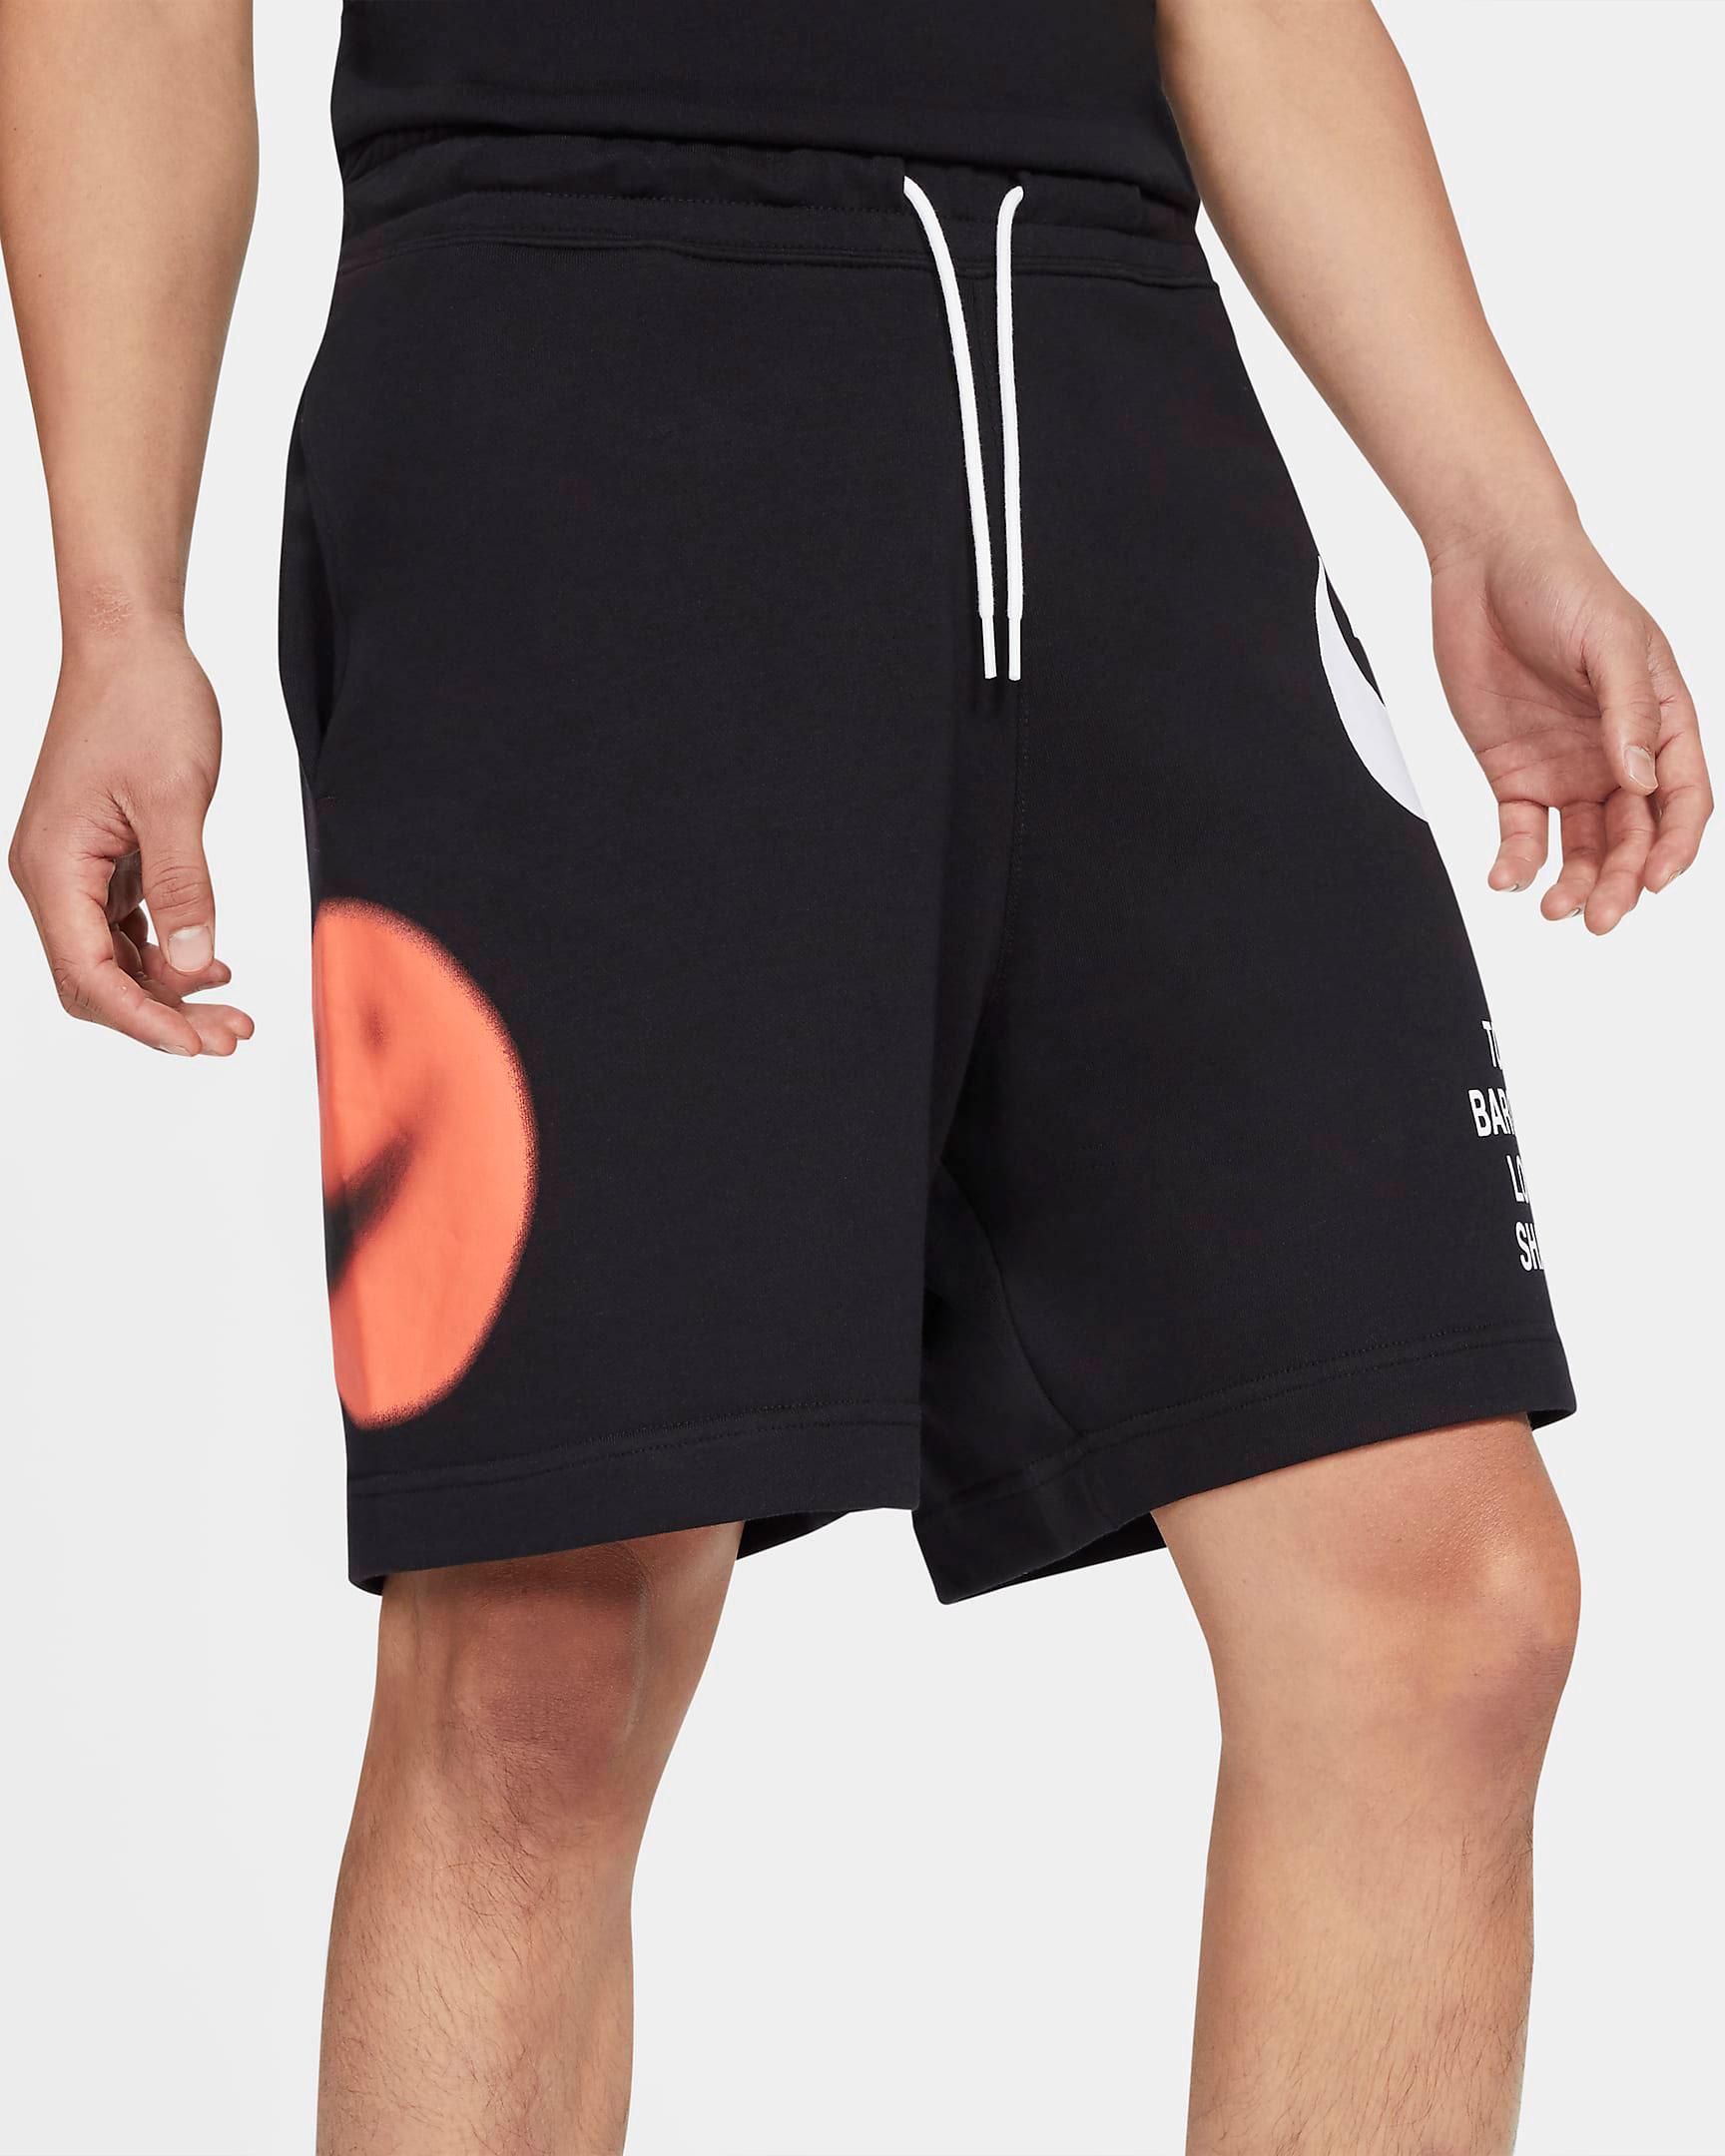 nike-world-tour-shorts-black-4